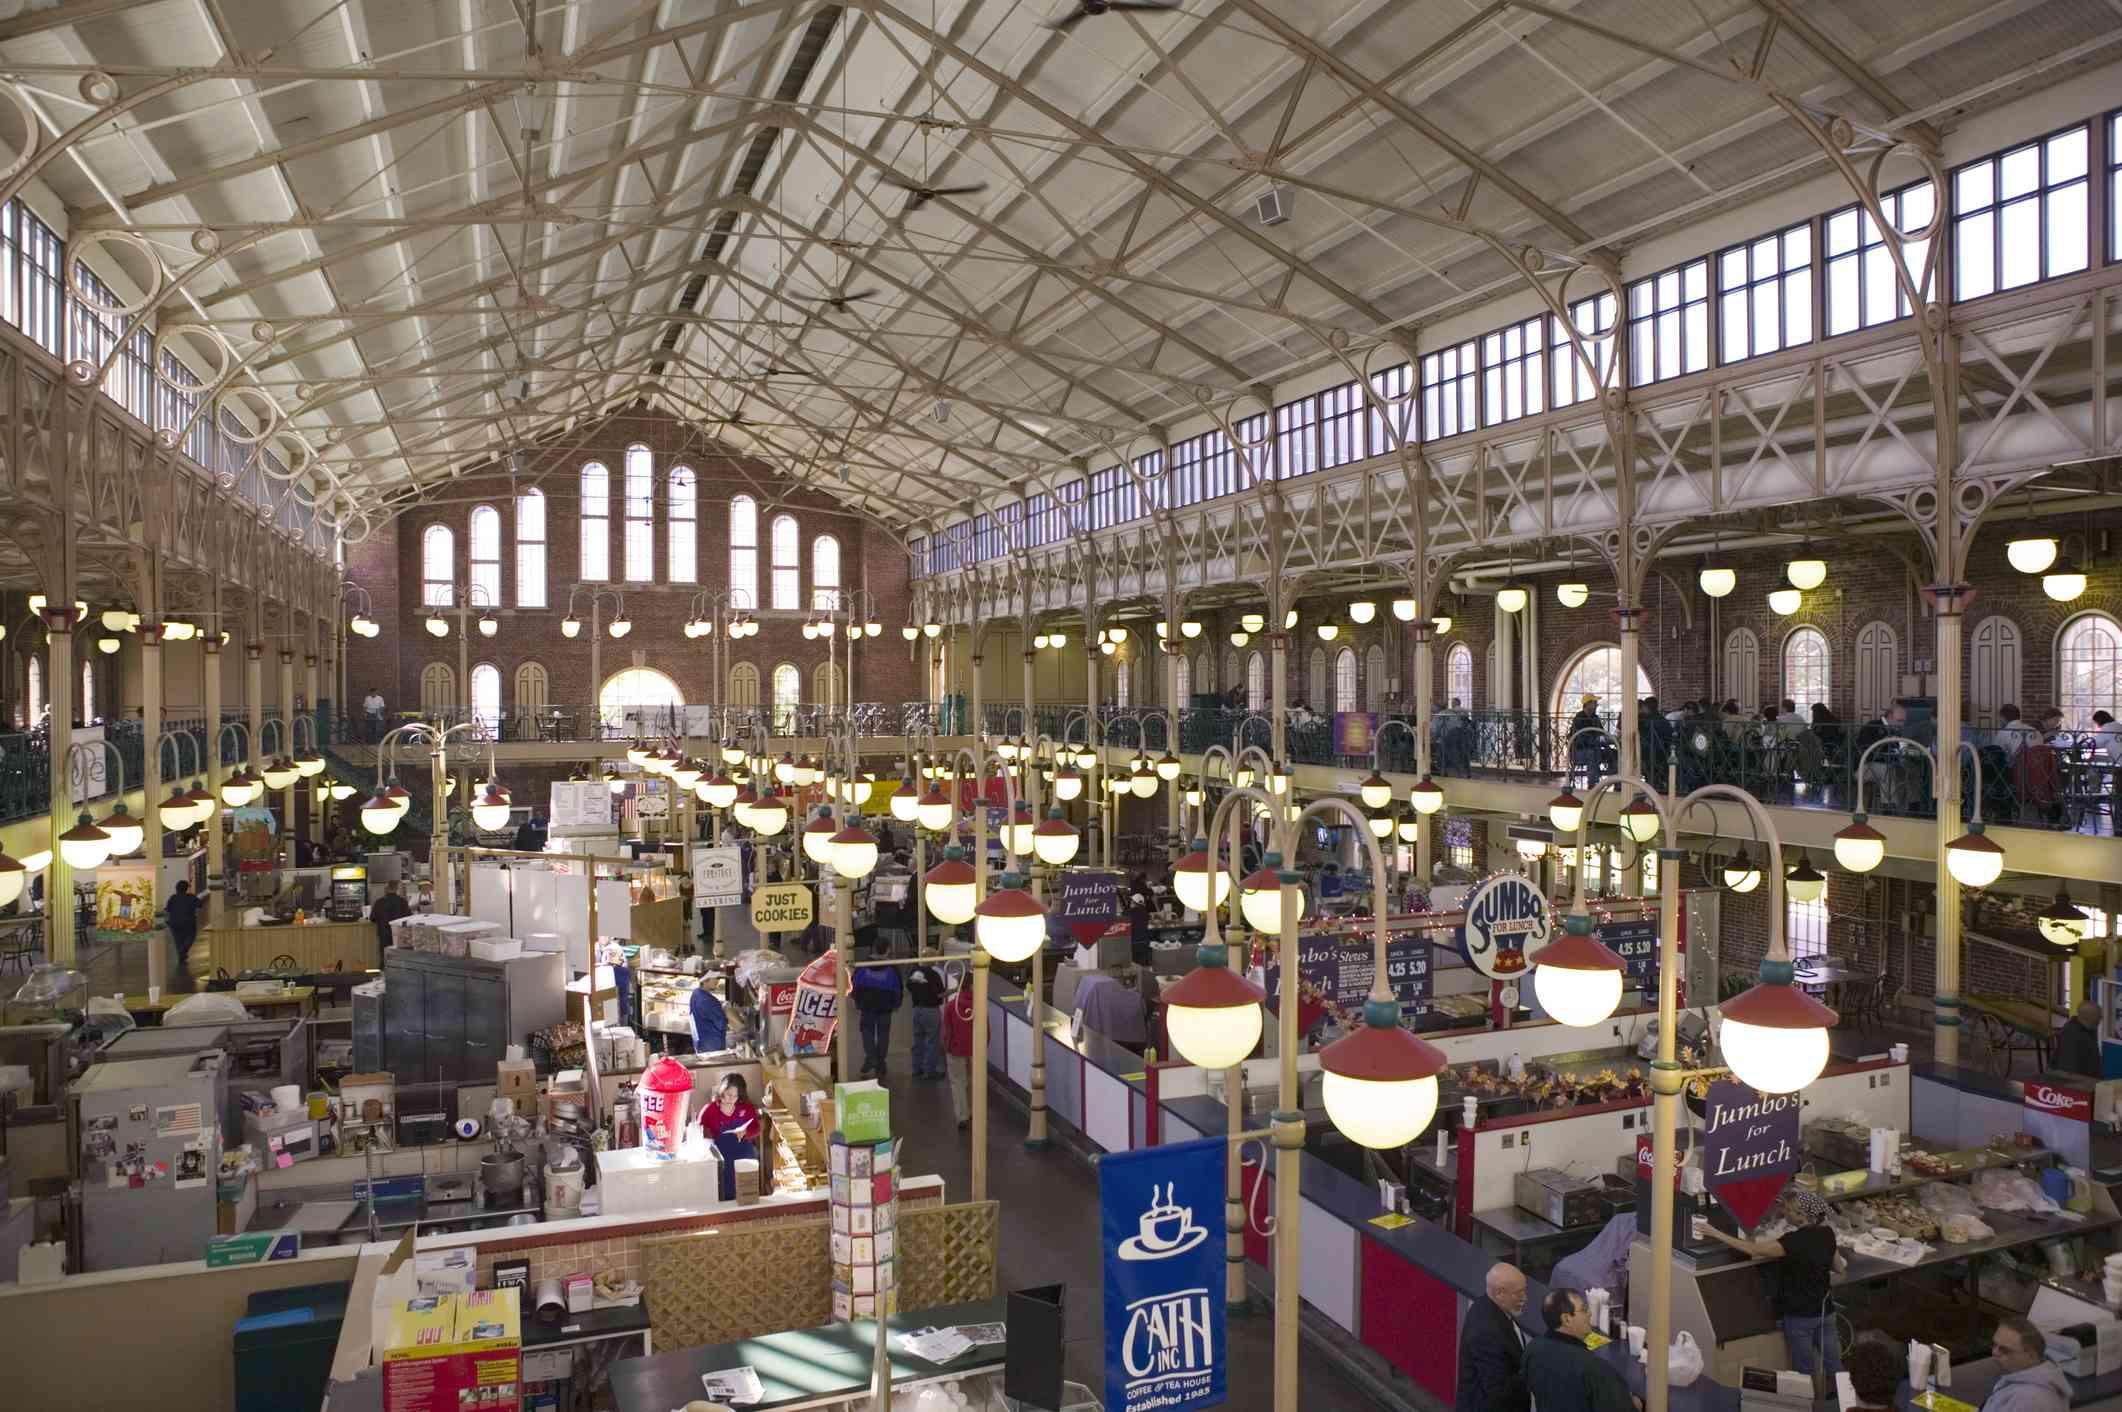 Indianapolis City Market, Indianapolis, Indiana, USA